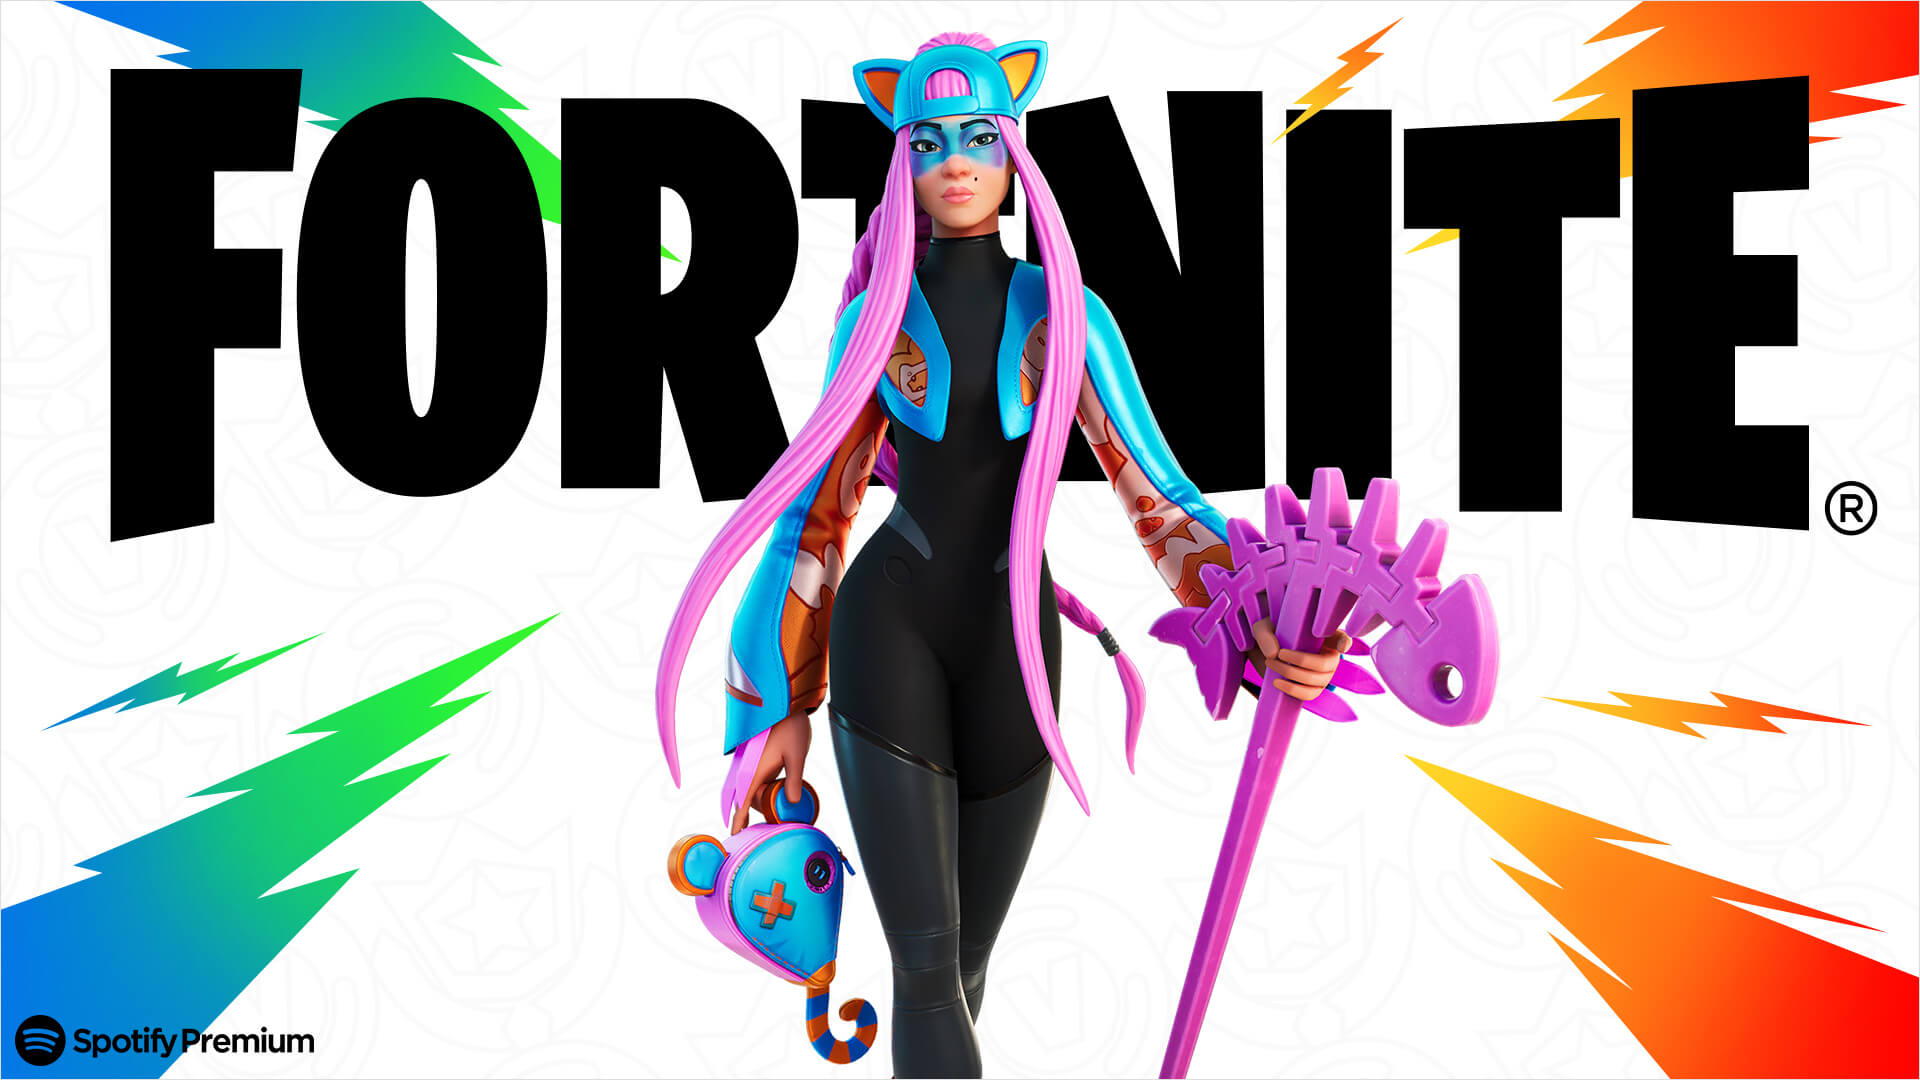 Fortnite Spotify Premium Promotion